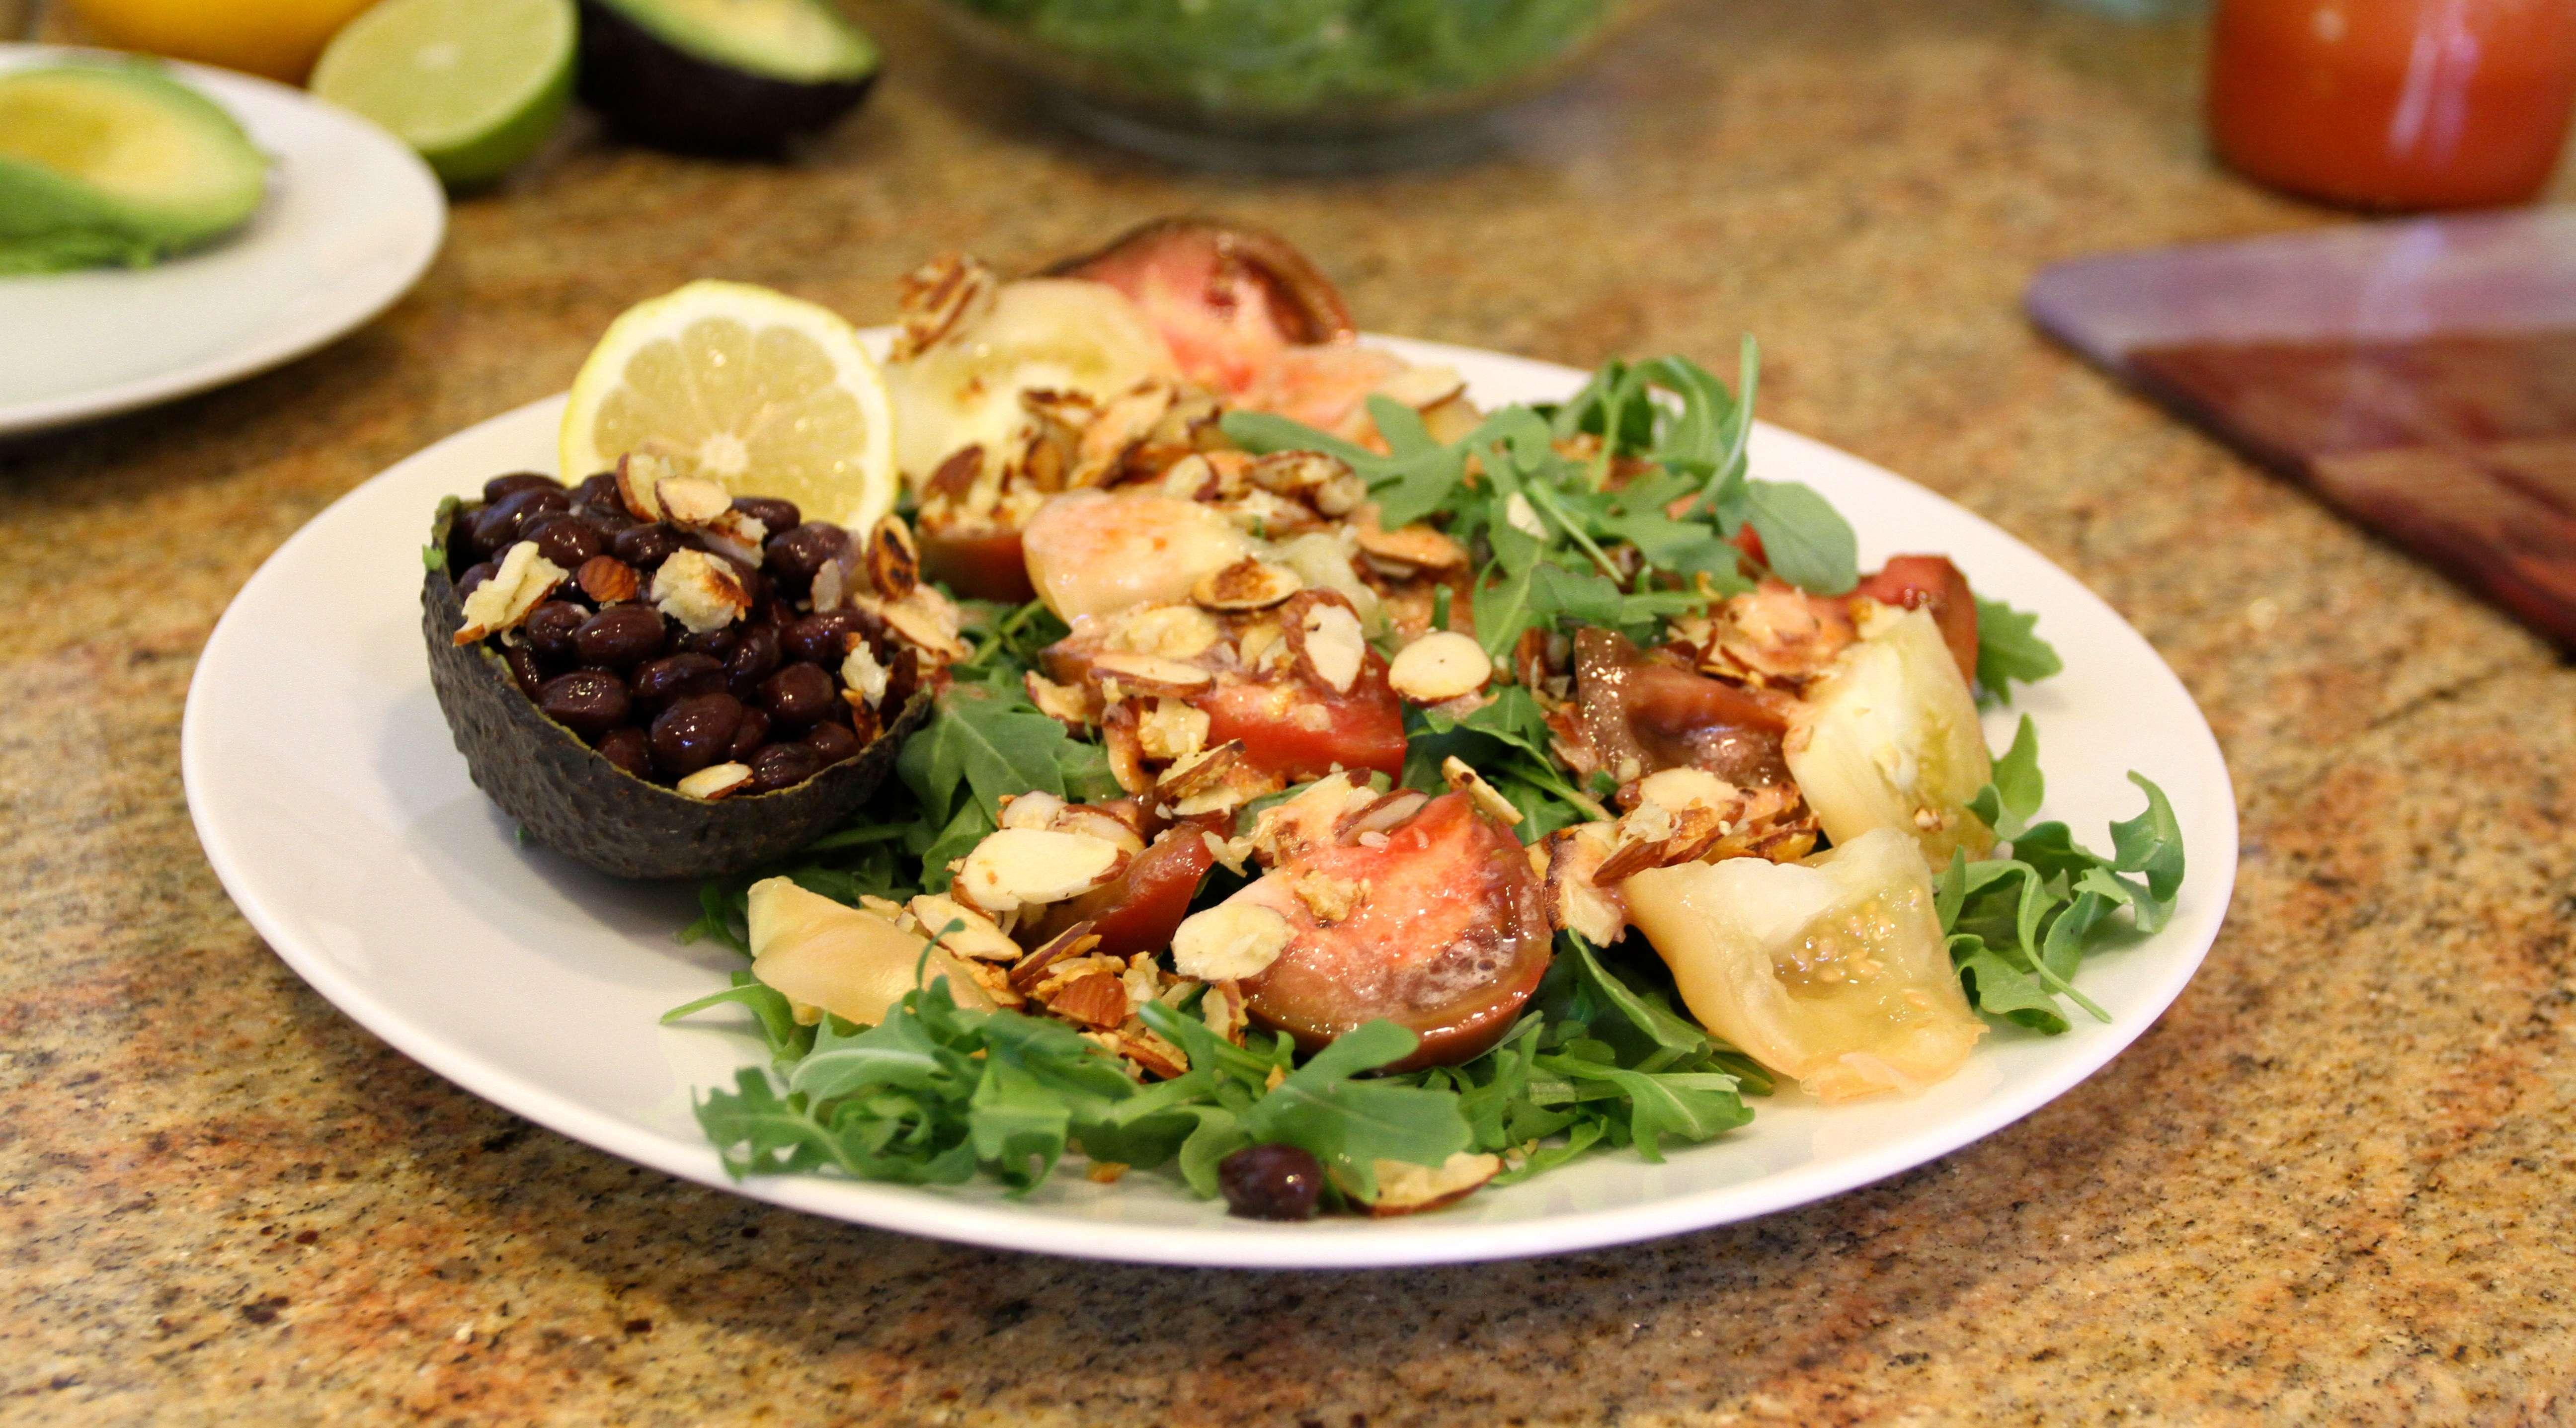 Arugula Toasted Almond Salad With Black Beans